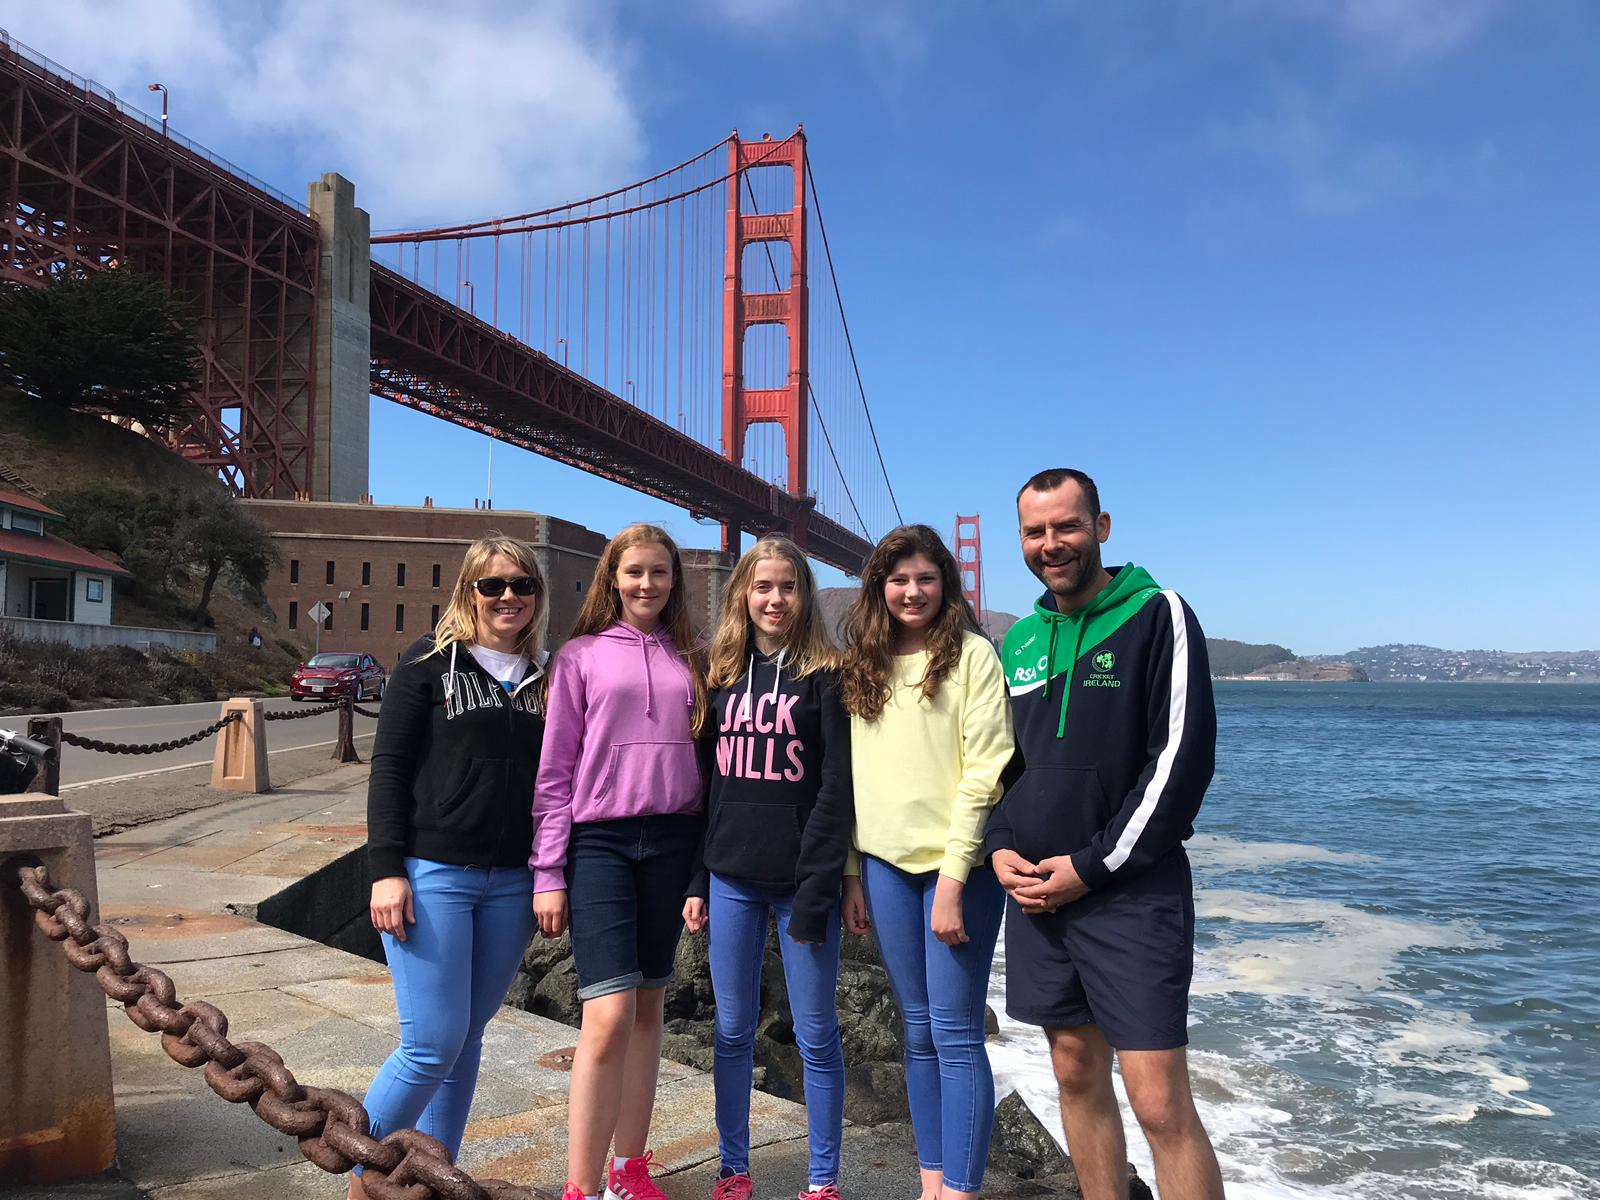 Chloe, Jessica and Lana with their teachers enjoying a quick photo op under the world famous Golden Gate Bridge.